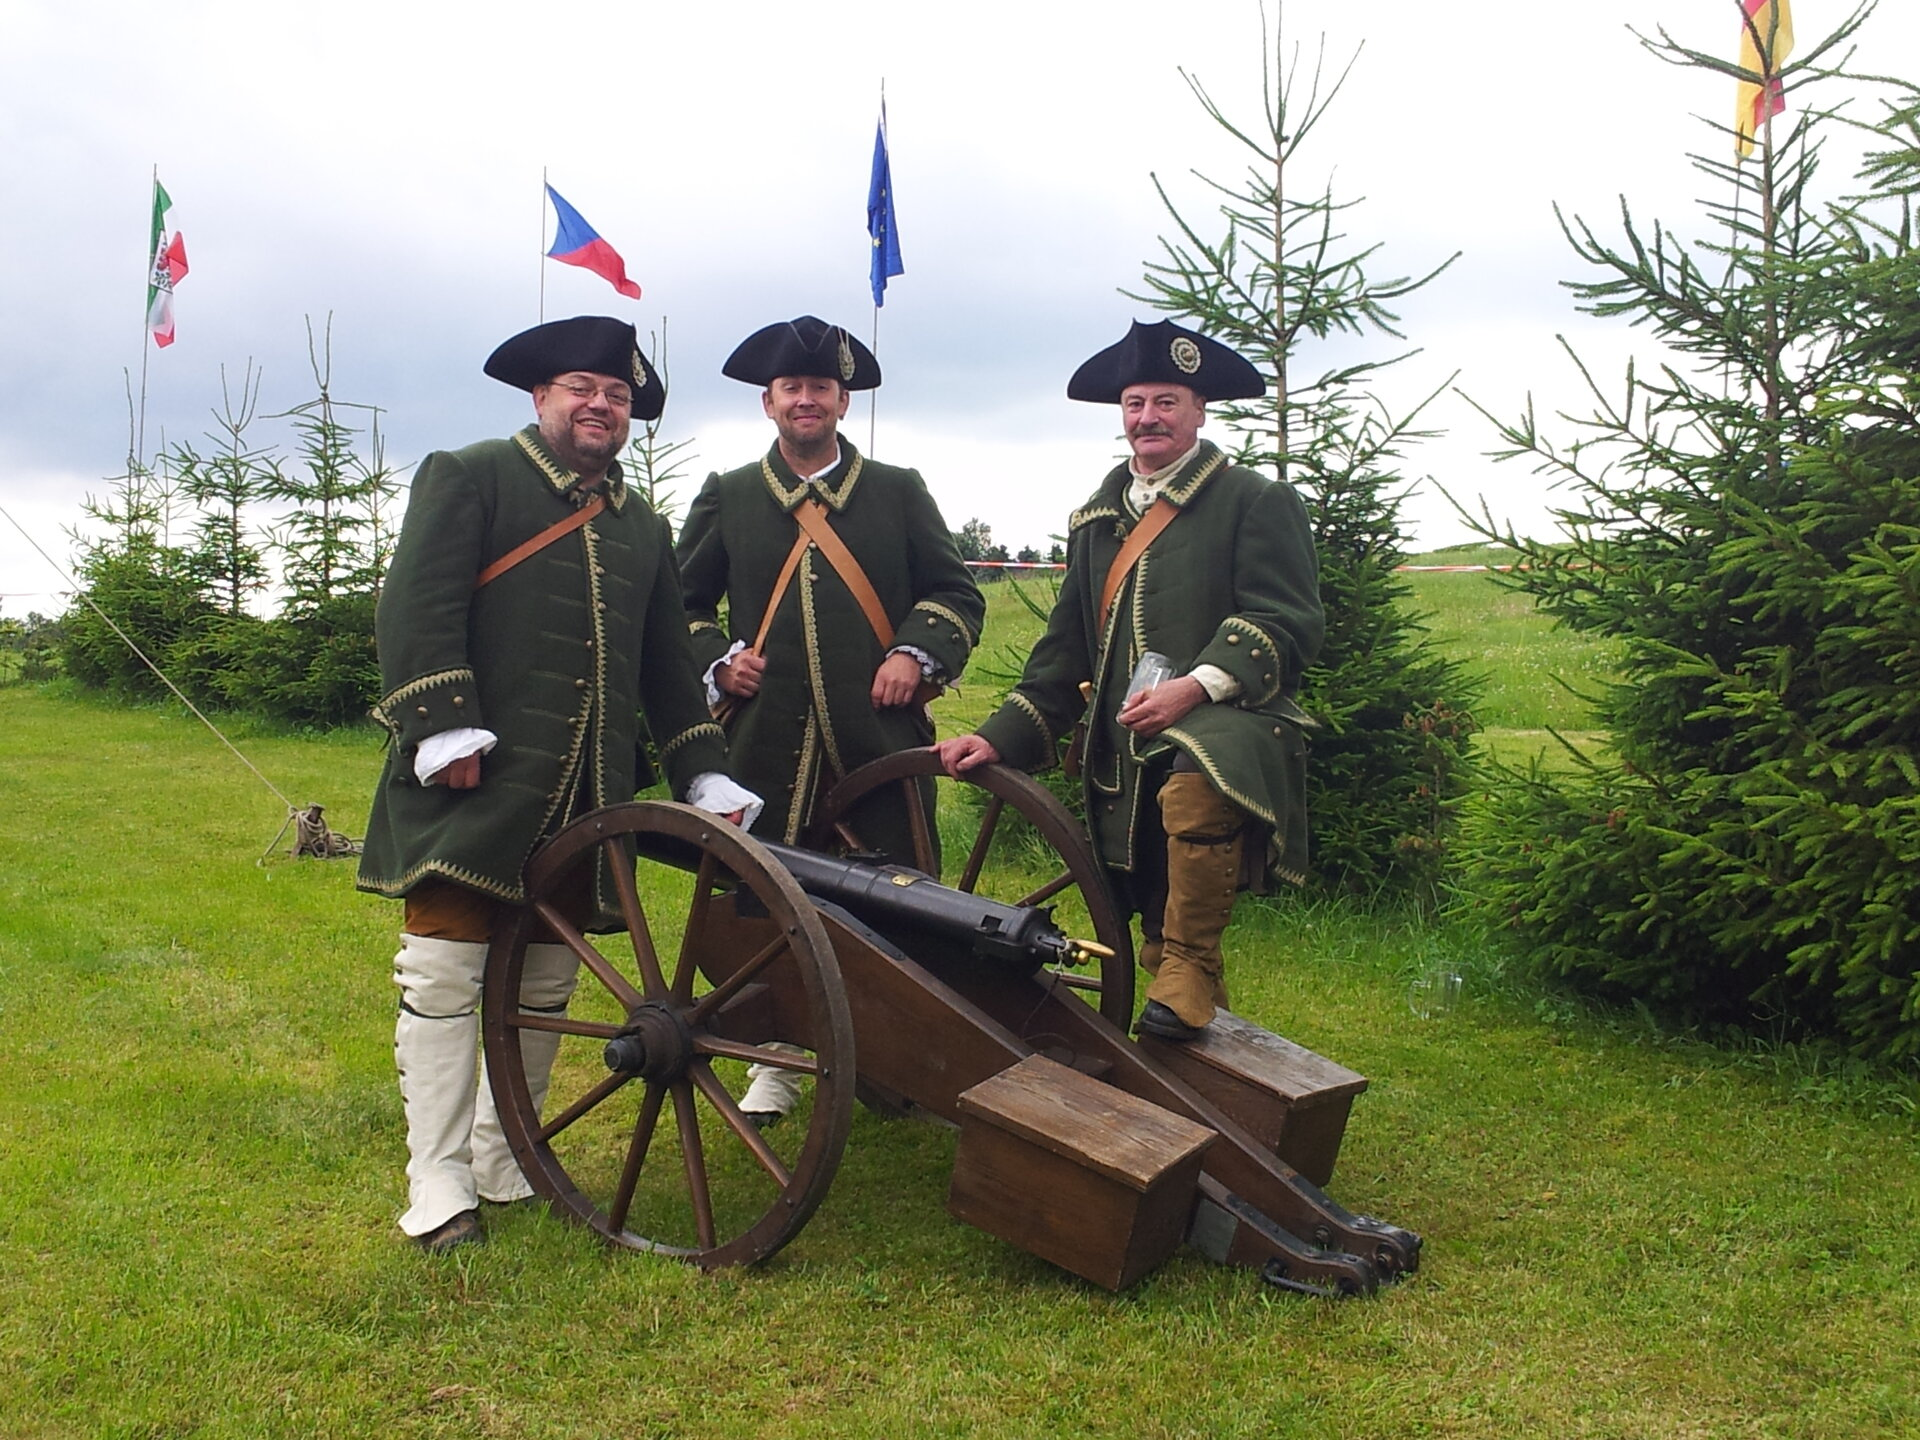 Historische_Uniformen